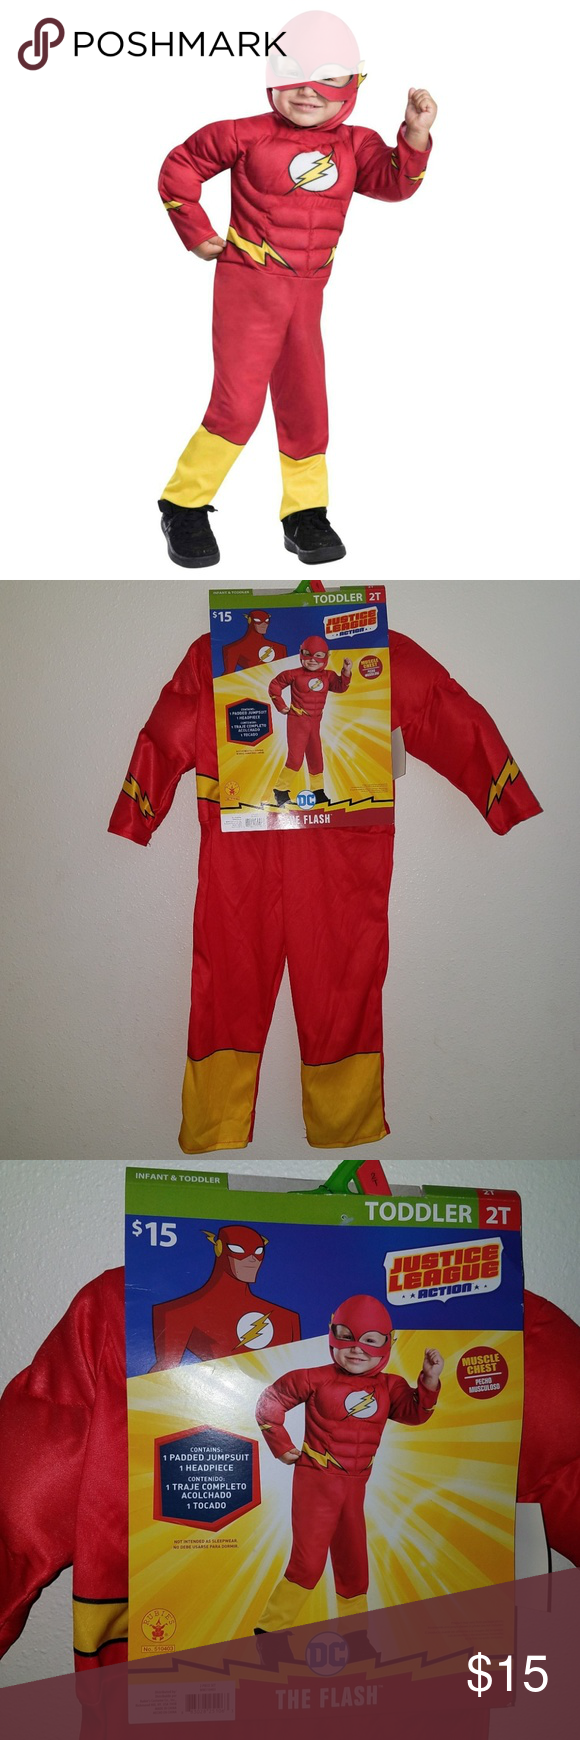 NWT Flash Costume 2T Toddler Halloween Superhero NWT in ...